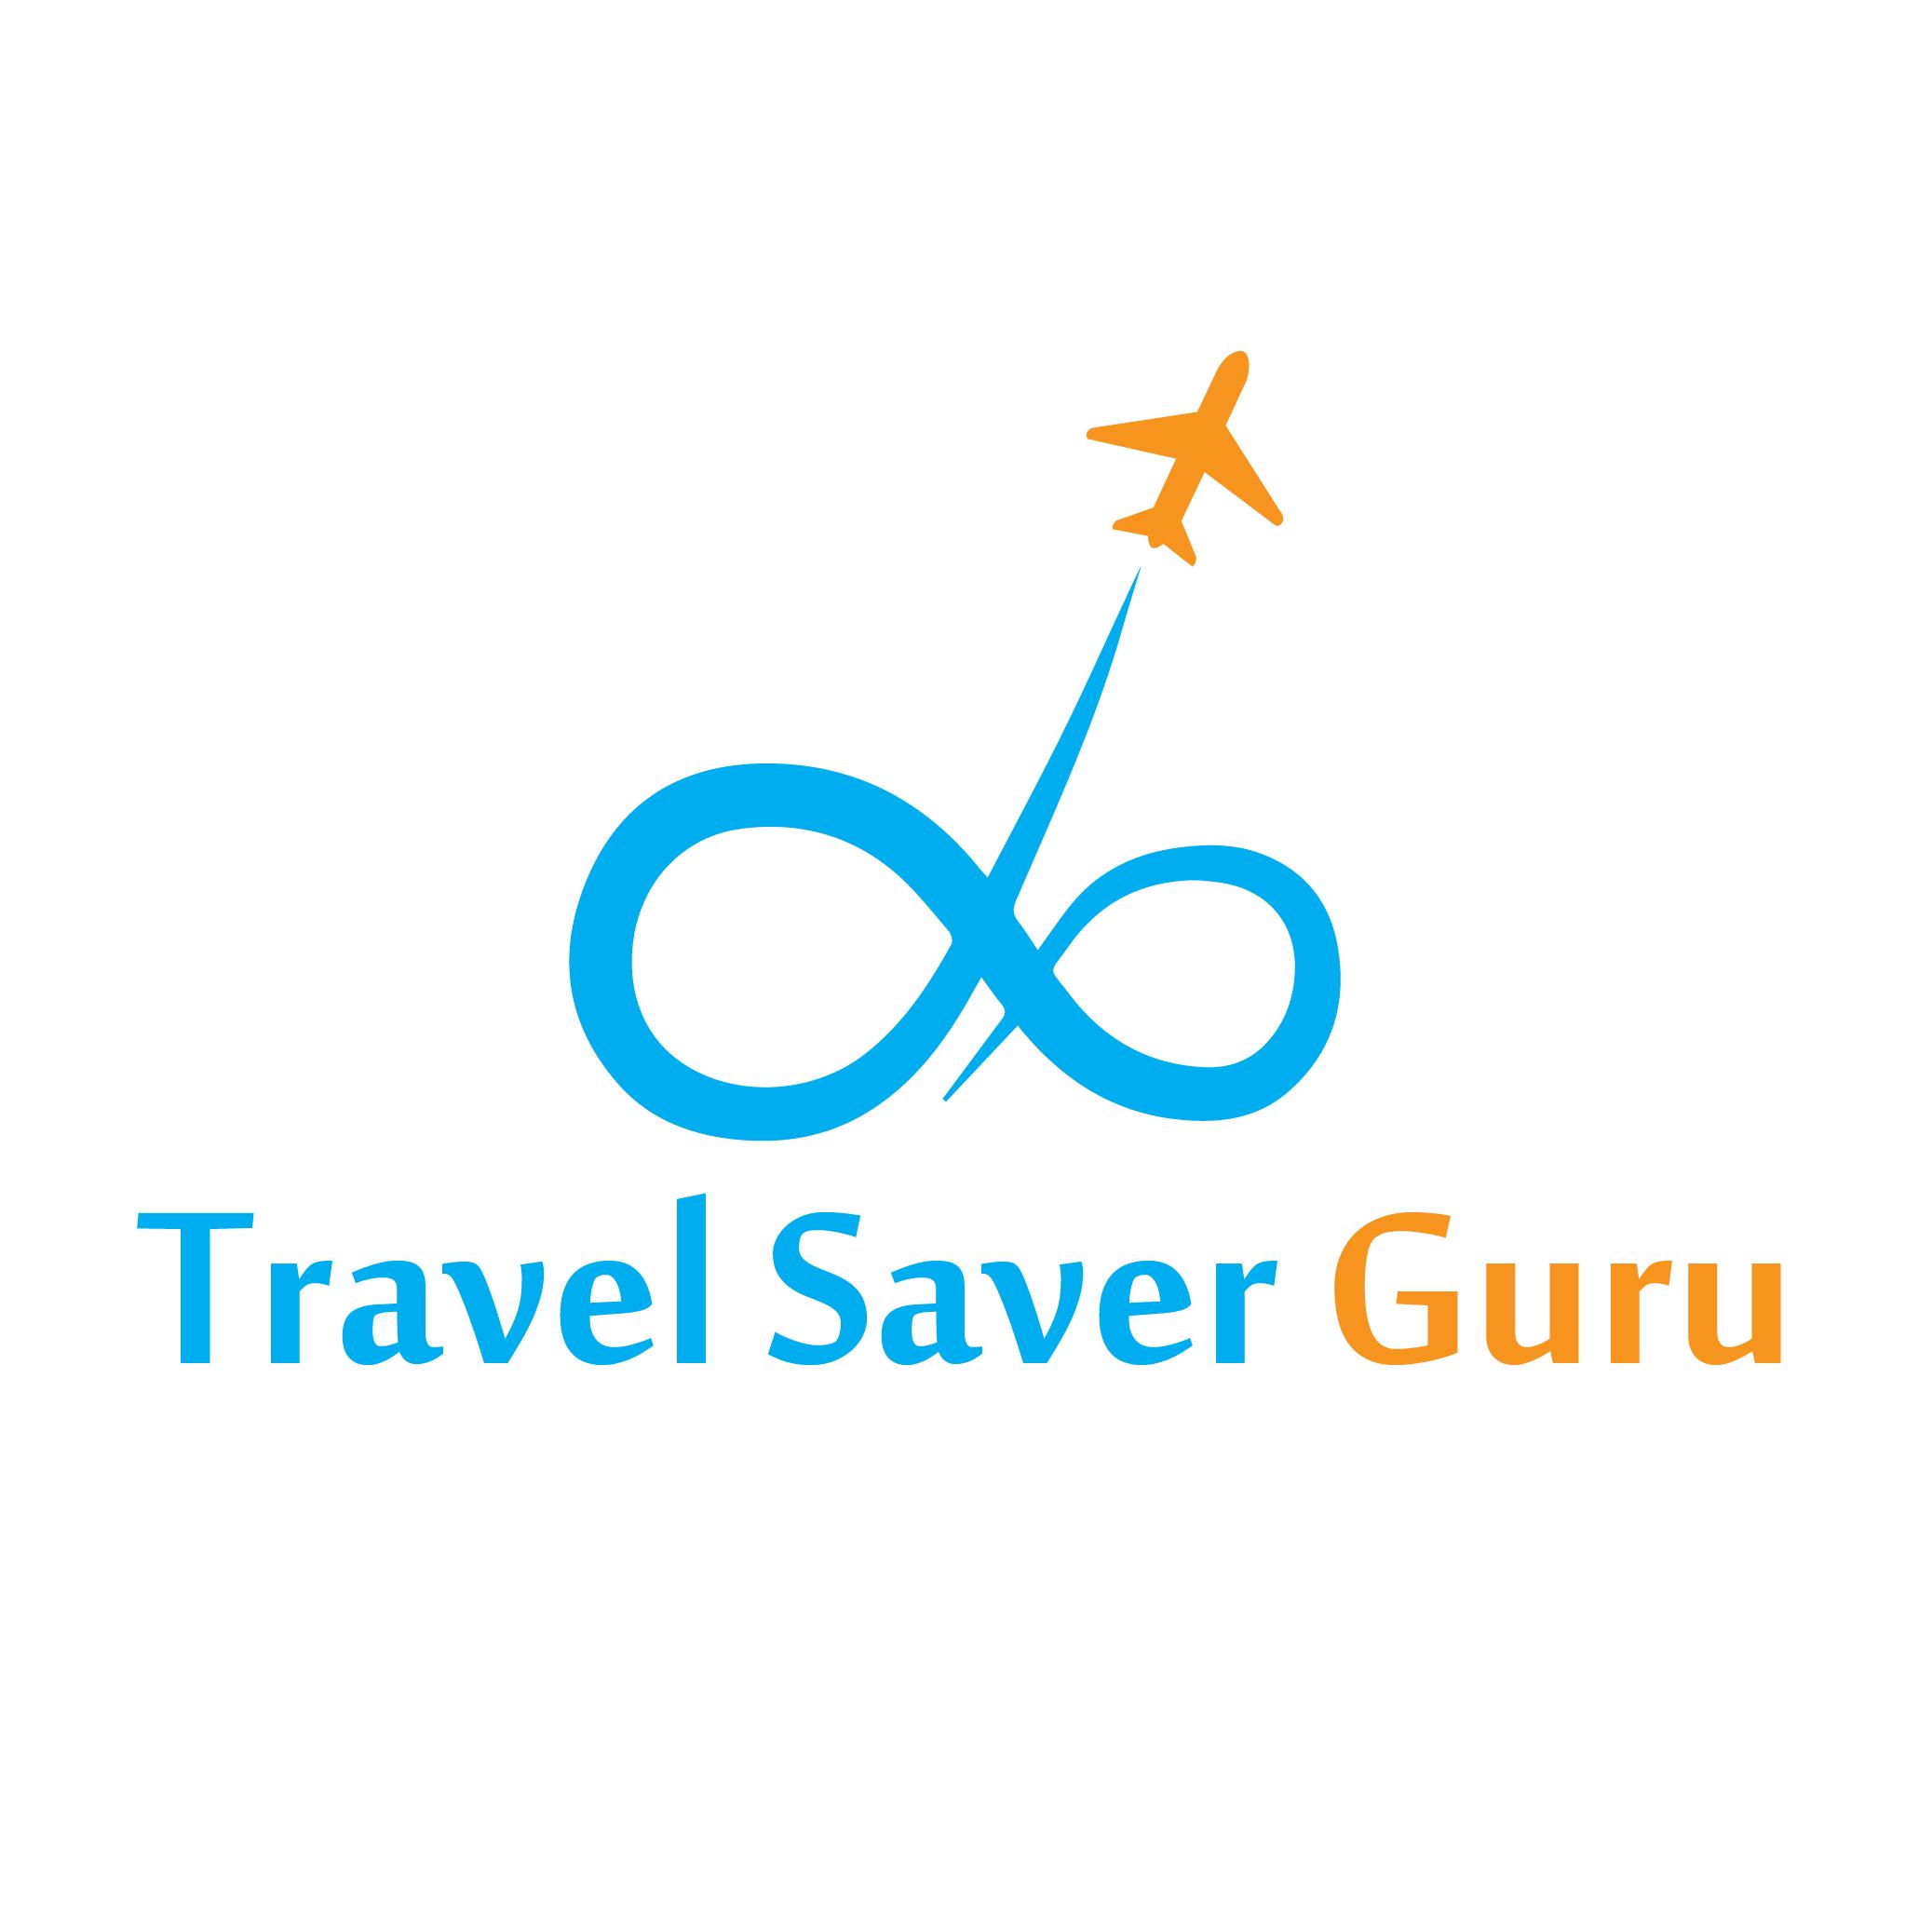 Travel Saver Guru